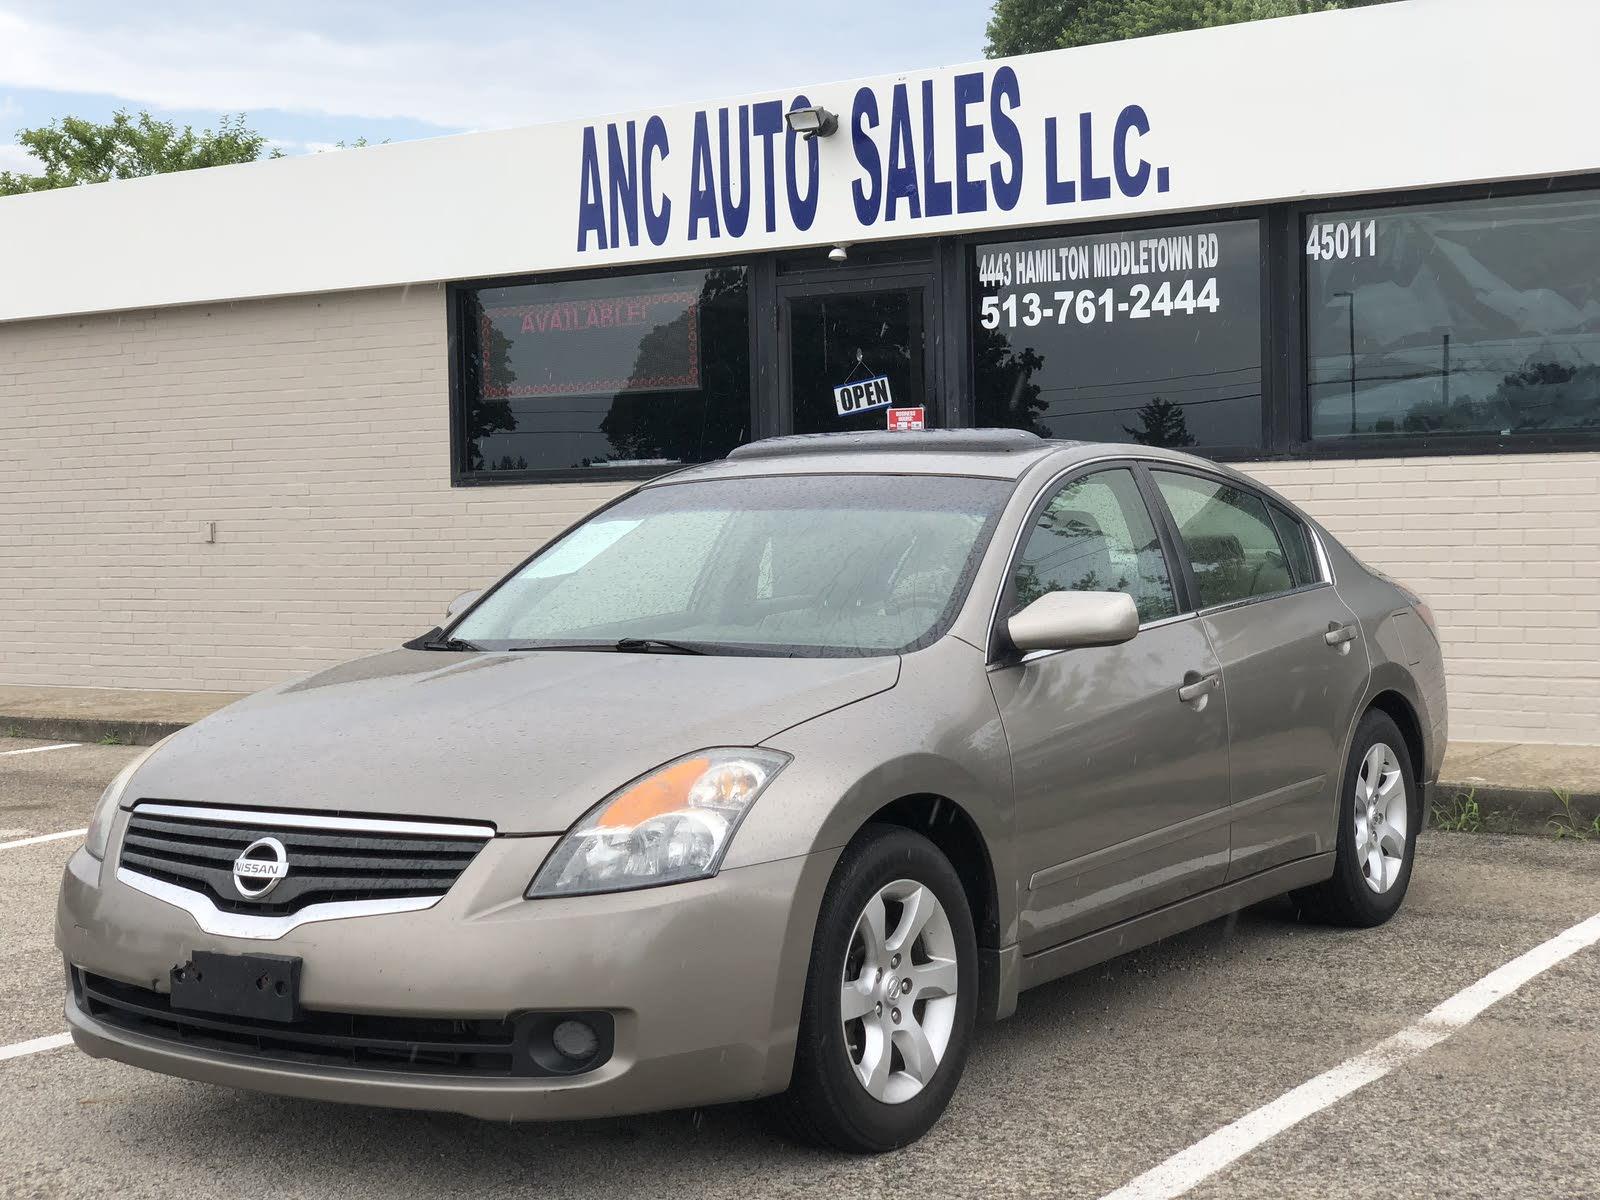 ANC Auto Sales LLC Liberty Township OH Read Consumer reviews